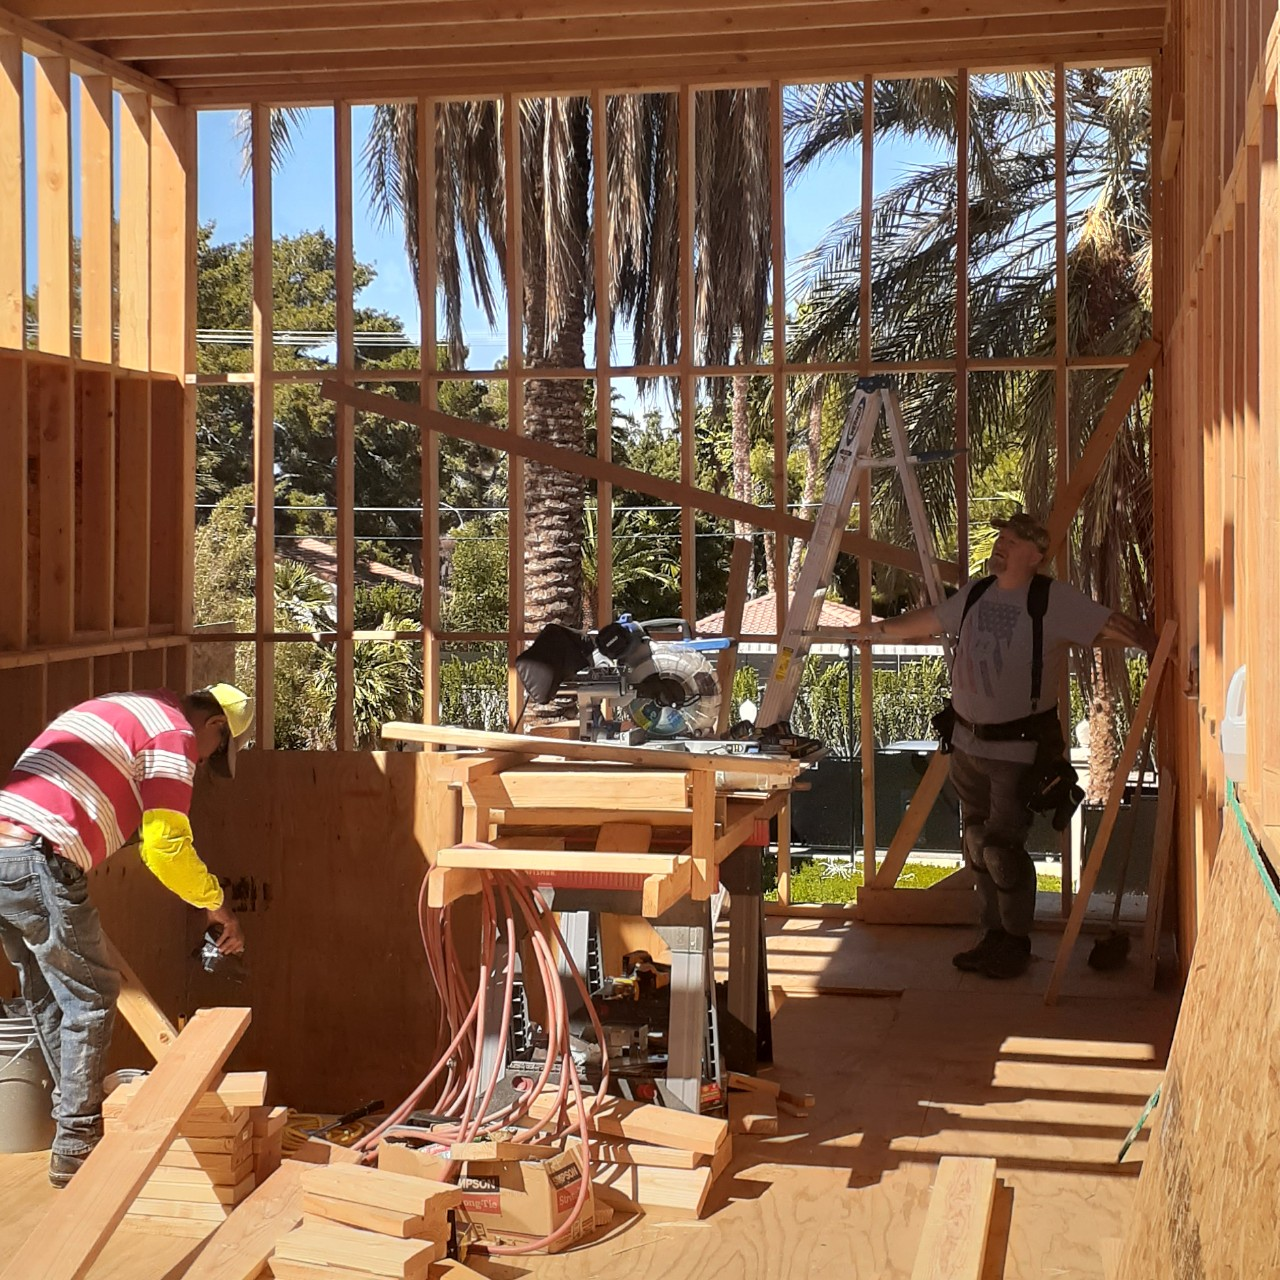 carpentry-wood-framing-second-floor-home-addition--framing-109